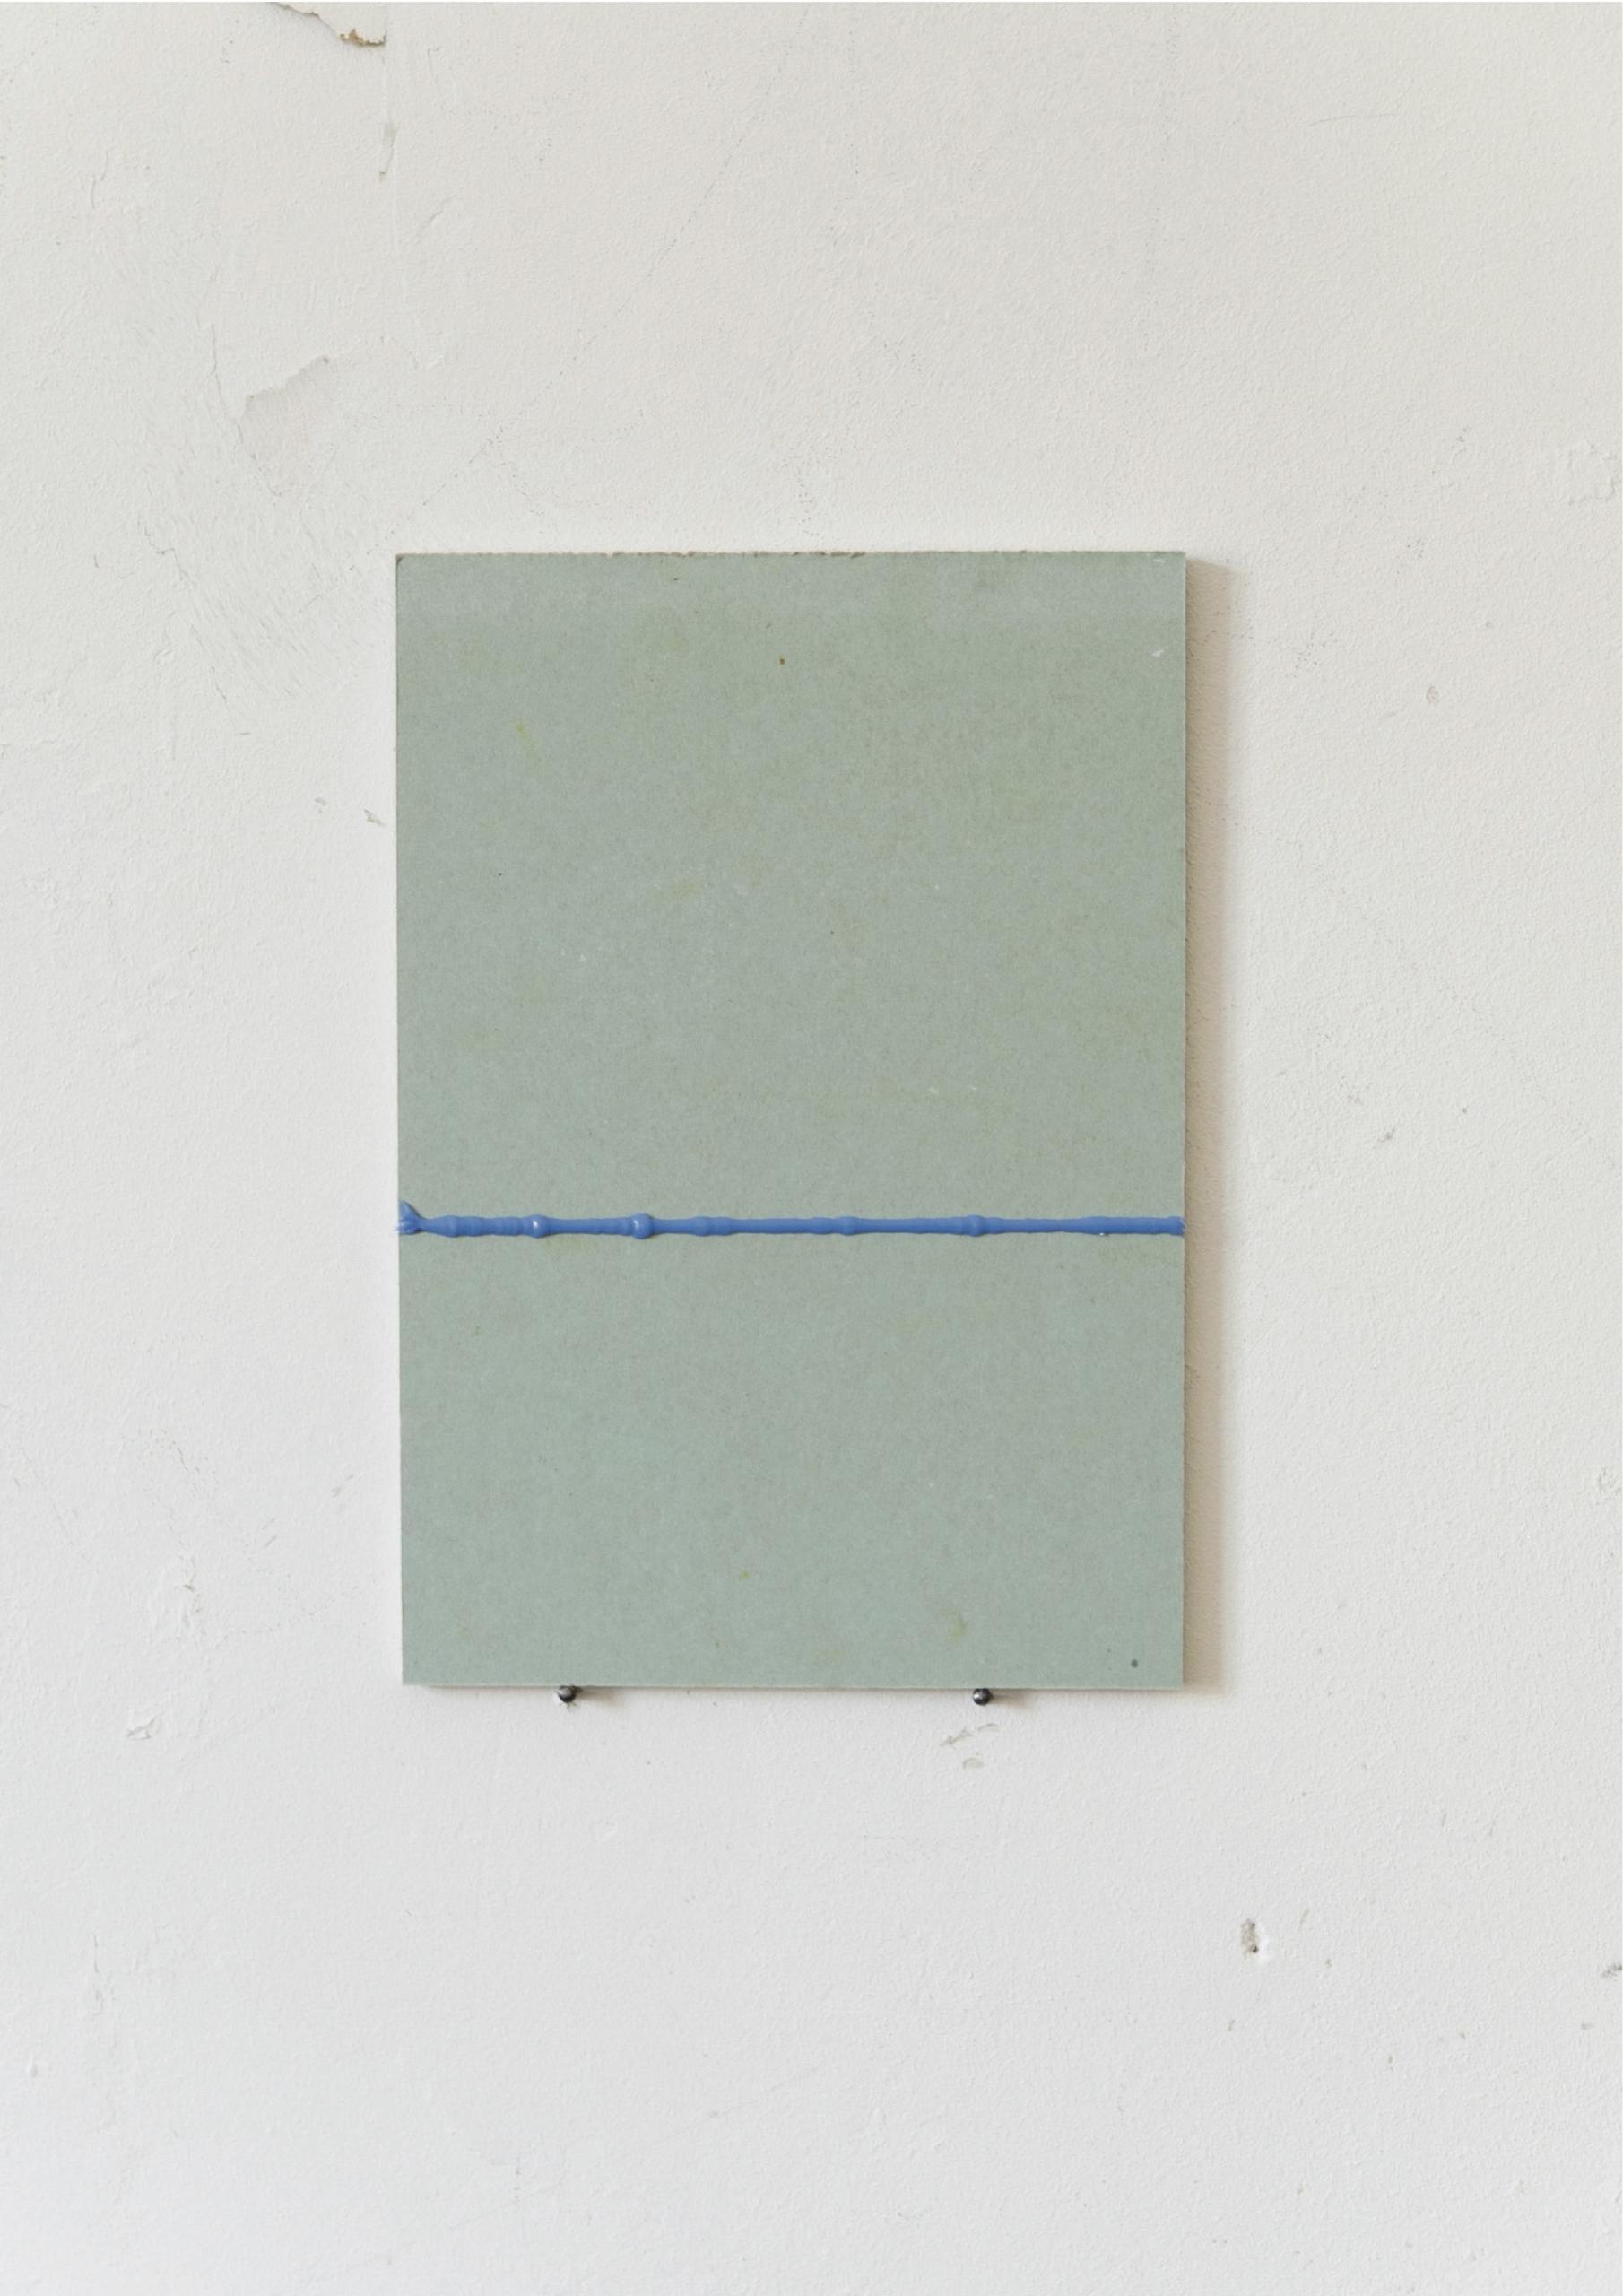 Kriz Olbricht, painting, 2016. Plasterboard, aluminum profiles, galvanized steel sheet, oil. 14,5 x 21 cm.